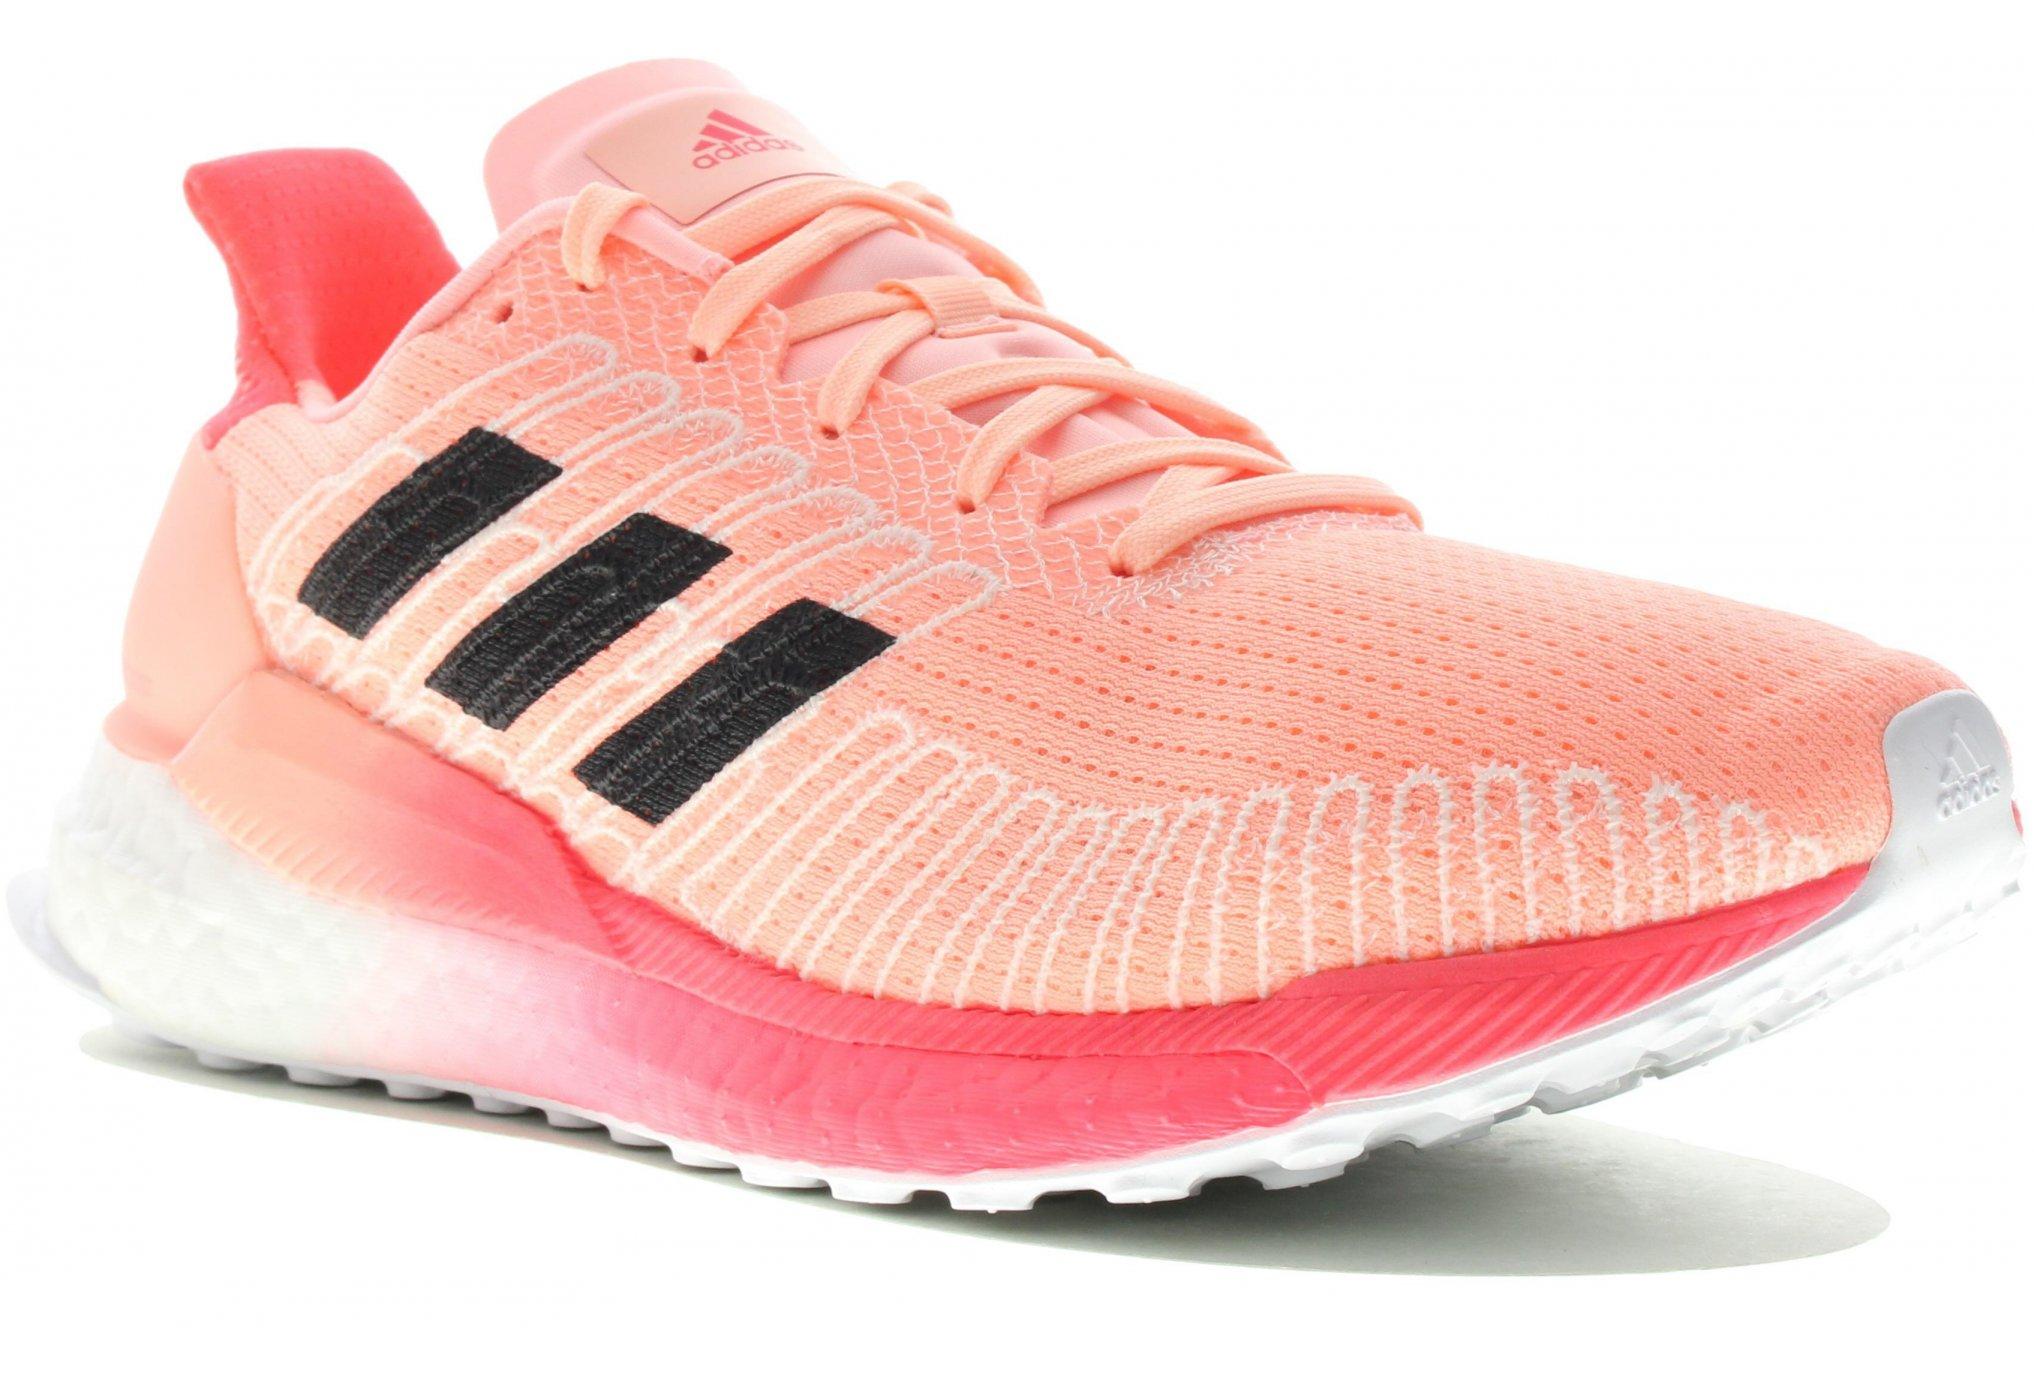 adidas Solar Boost 19 Chaussures running femme